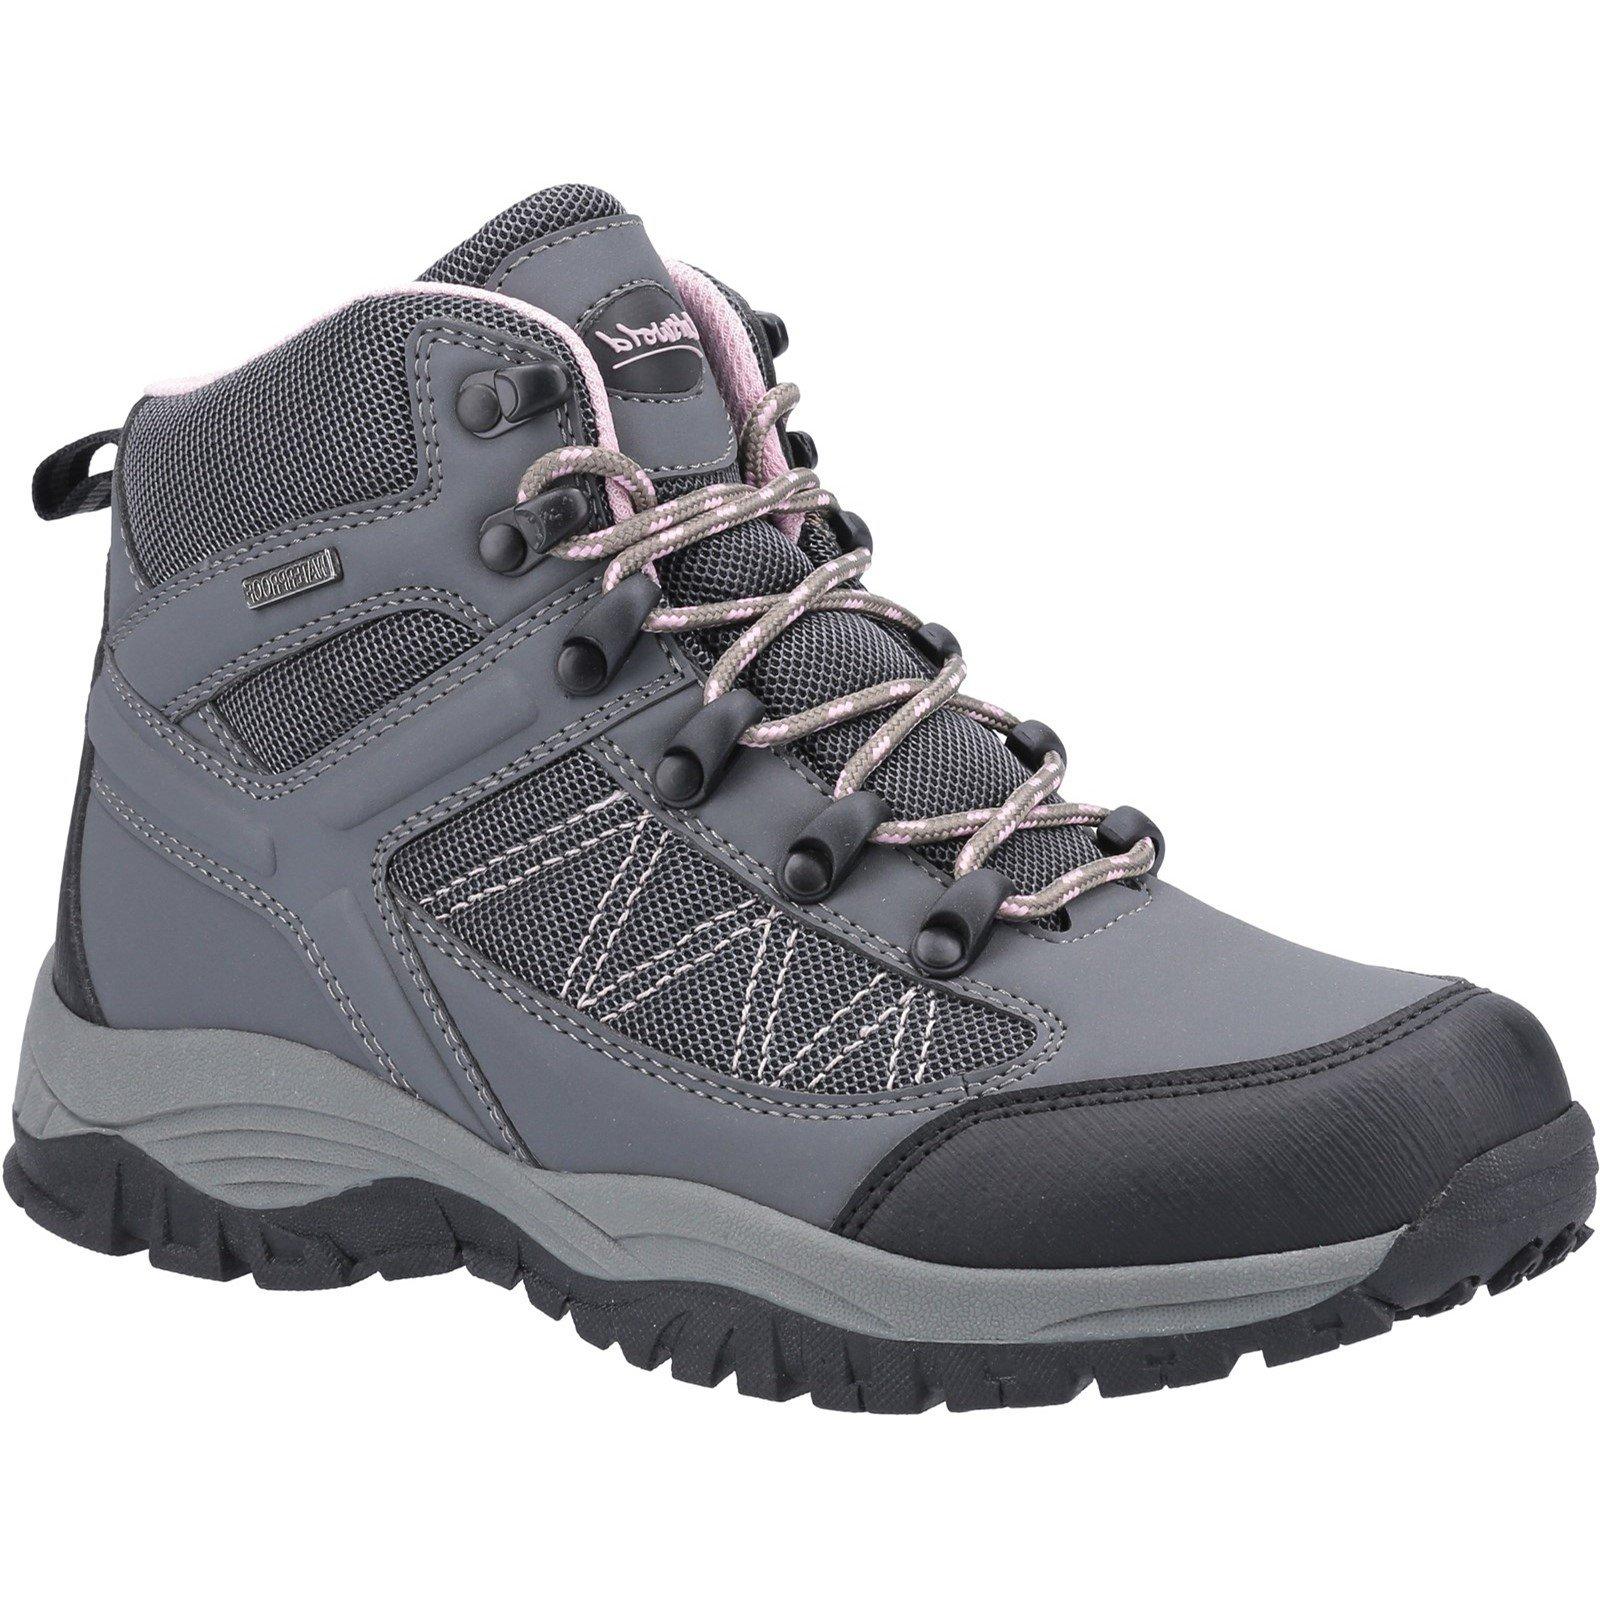 Cotswold Women's Maisemore Hiking Boot Grey 32986 - Grey 7